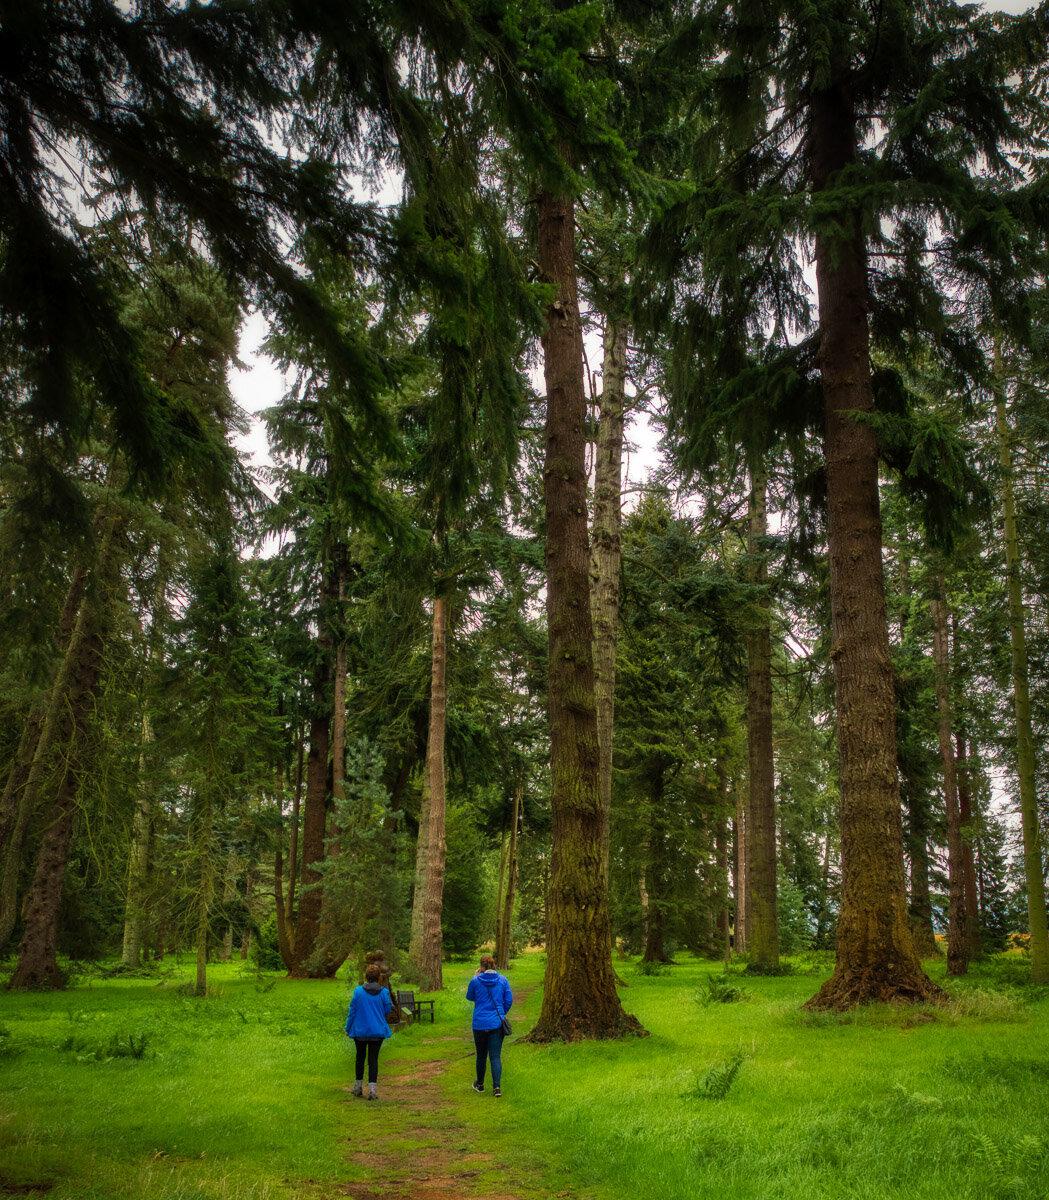 Macbeth trail at Scone pinetum